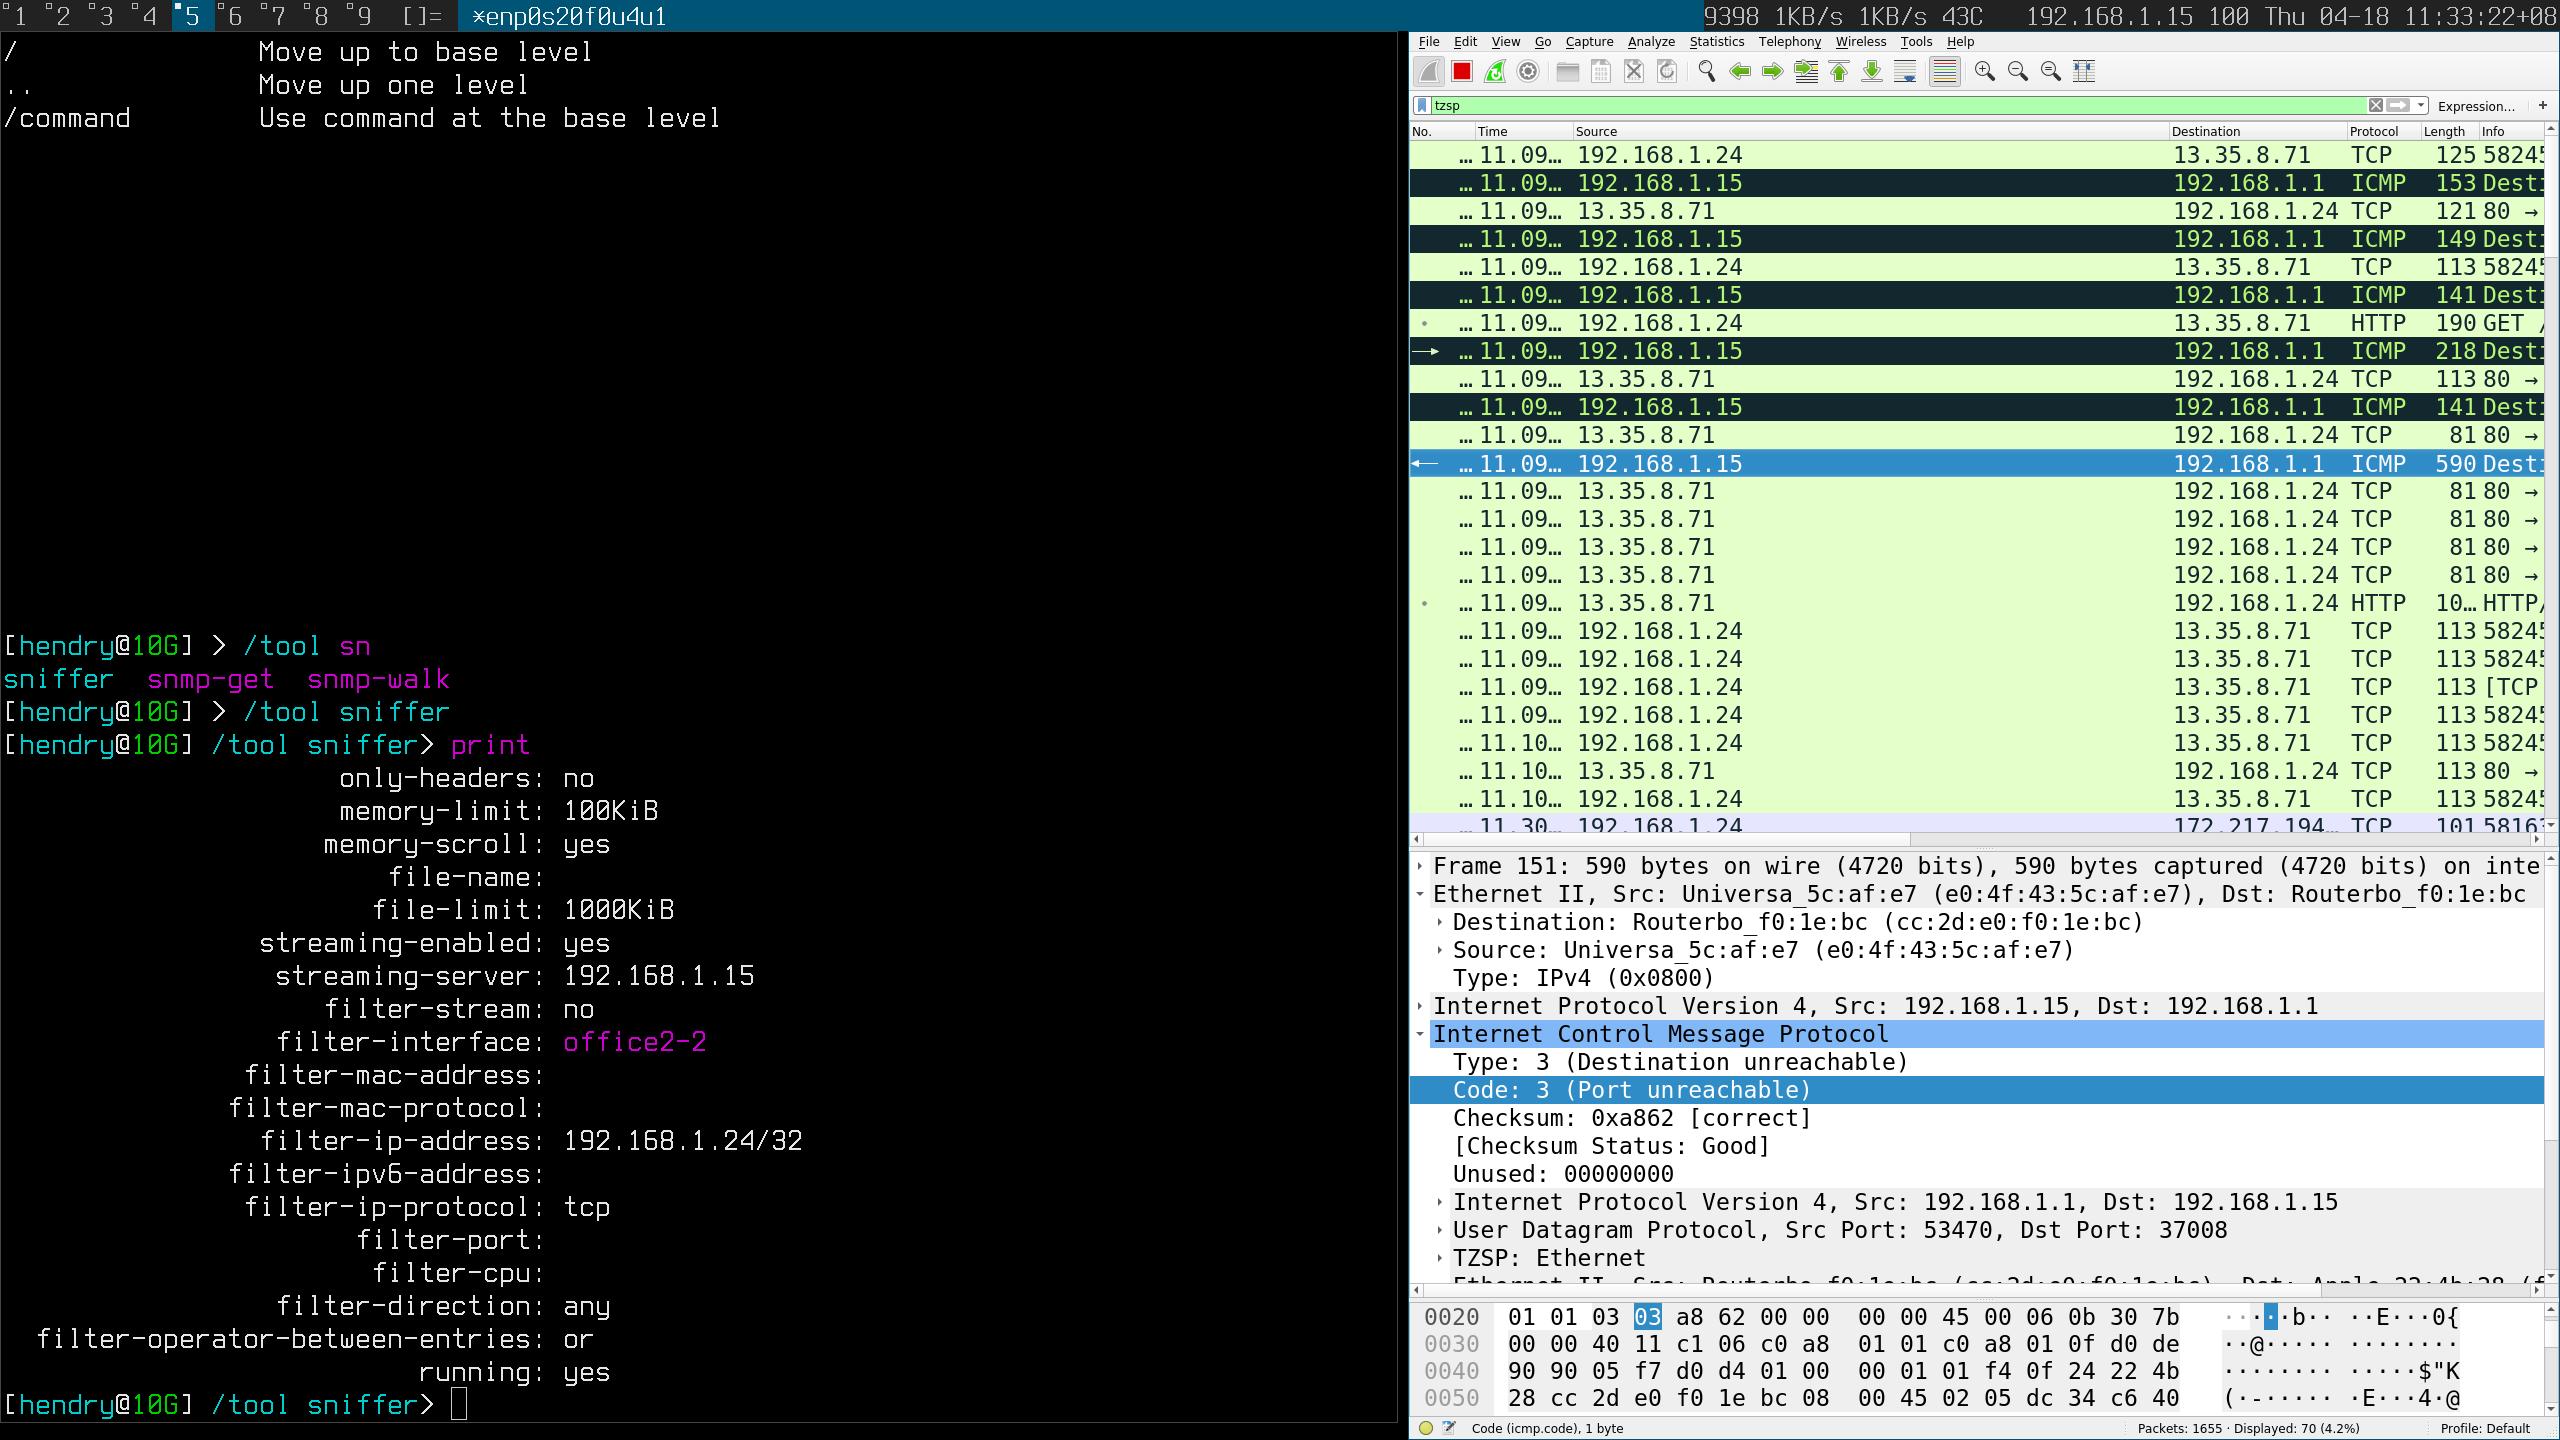 tool sniffer Code: 3 (Port unreachable) - MikroTik